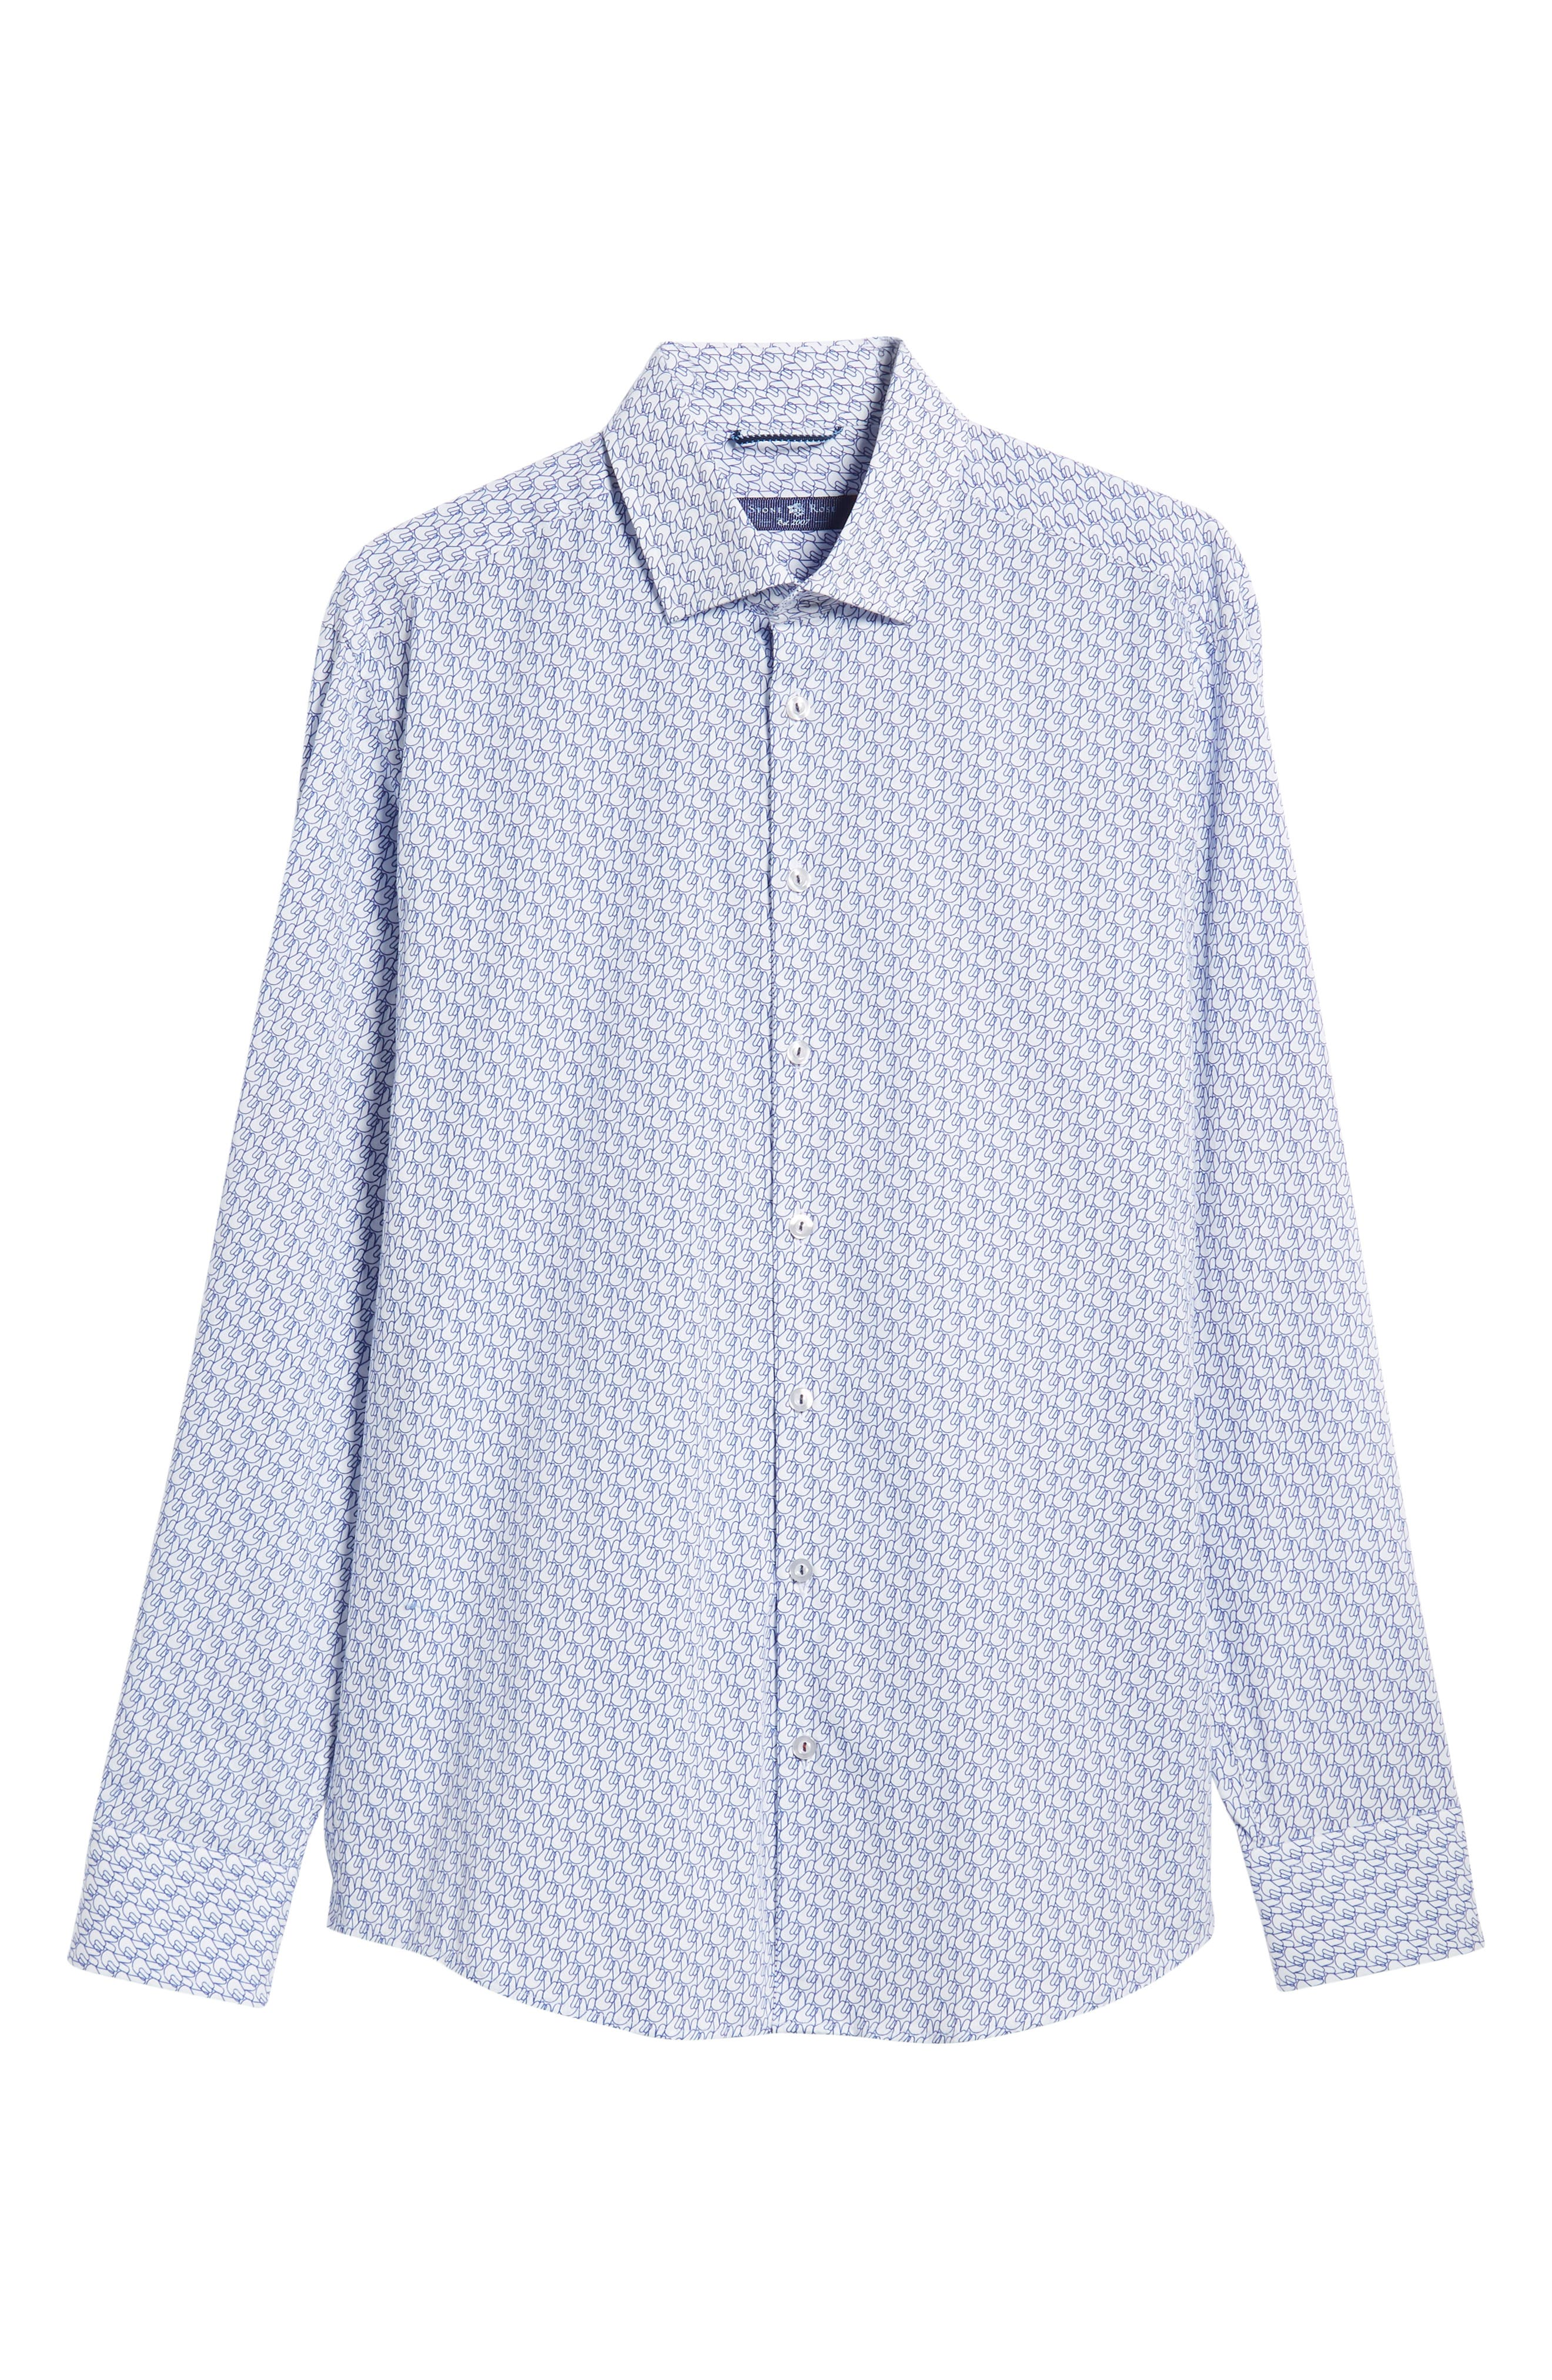 Trim Fit Sport Shirt,                             Alternate thumbnail 5, color,                             WHITE